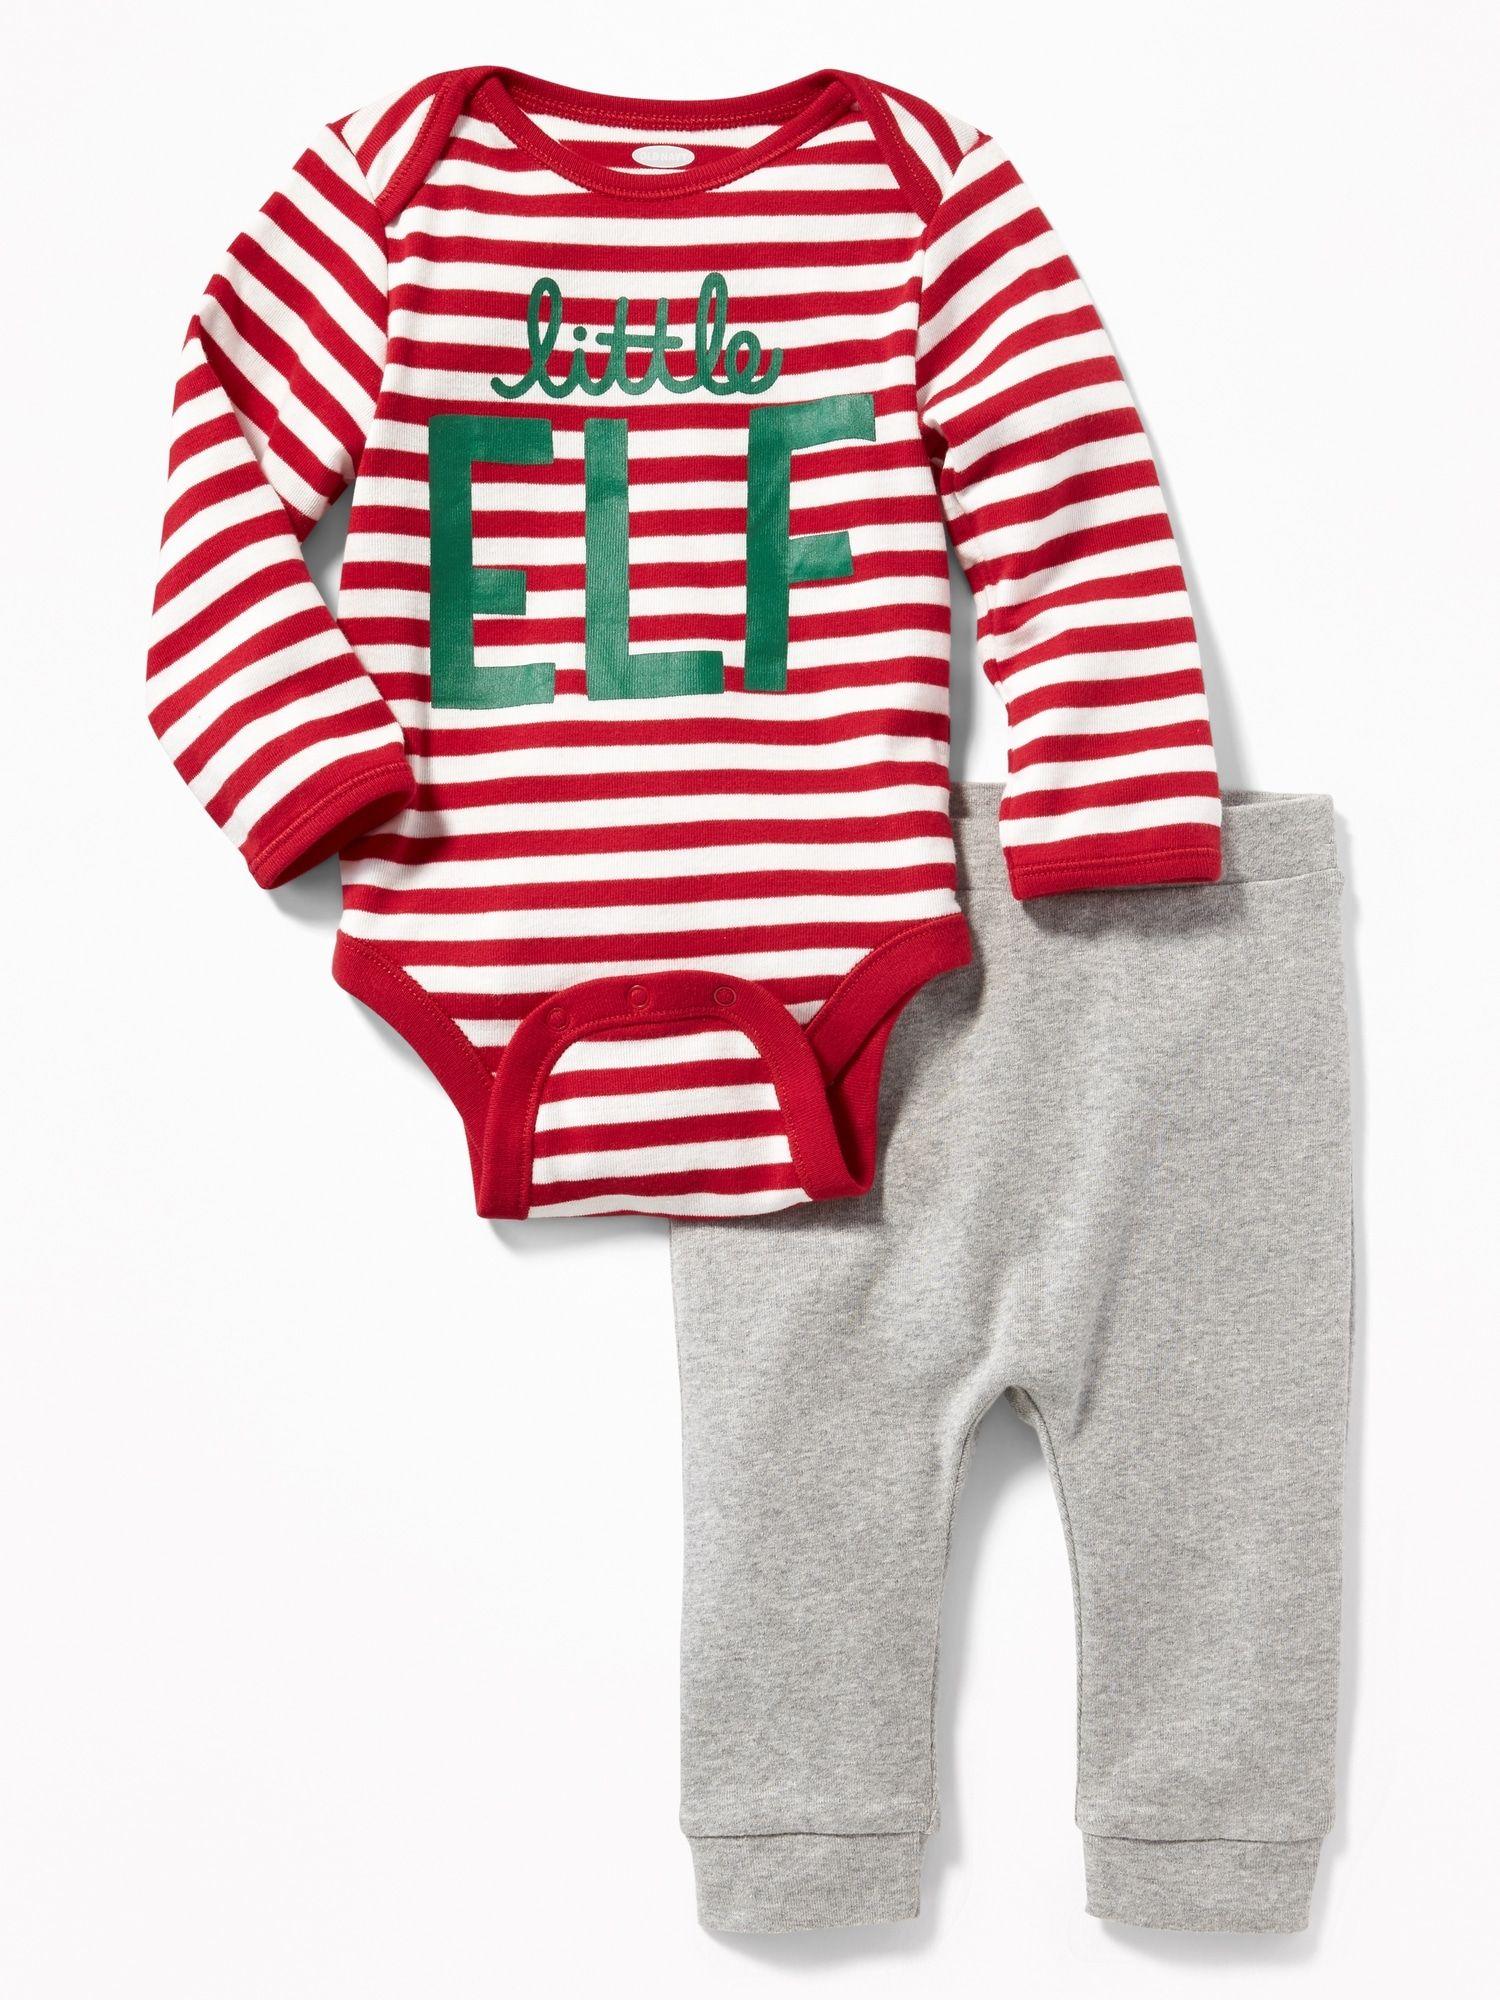 3c940de6c Holiday-Graphic Bodysuit   Patterned Pants Set for Baby